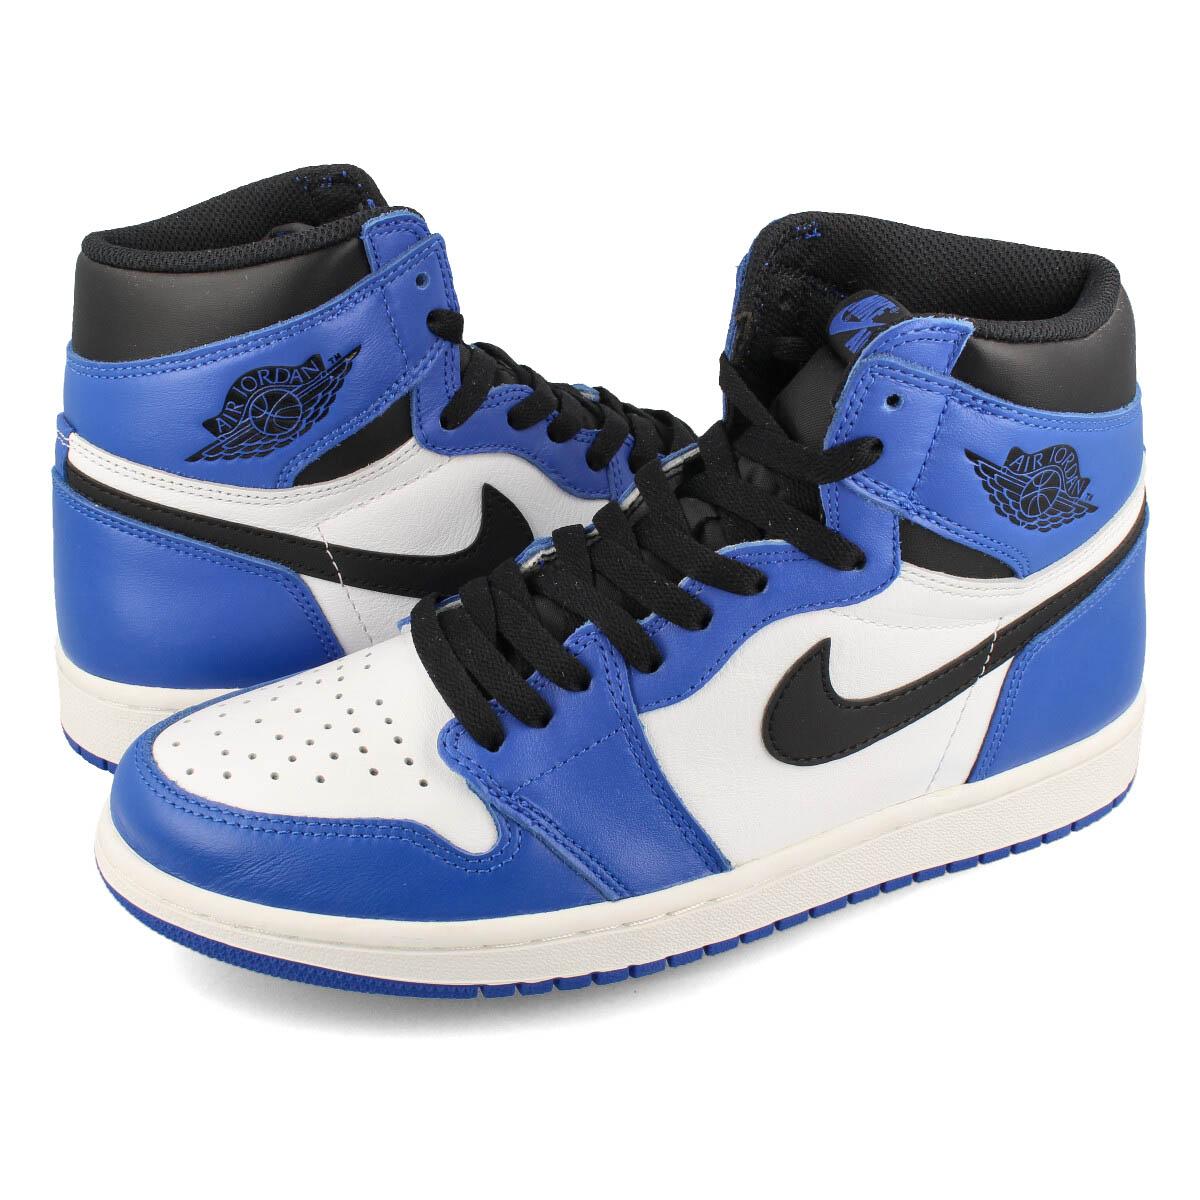 NIKE AIR JORDAN 1 RETRO HIGH OG Nike Air Jordan 1 nostalgic high OG GAME  ROYAL SUMMIT WHITE BLACK 4dc9fd5e805